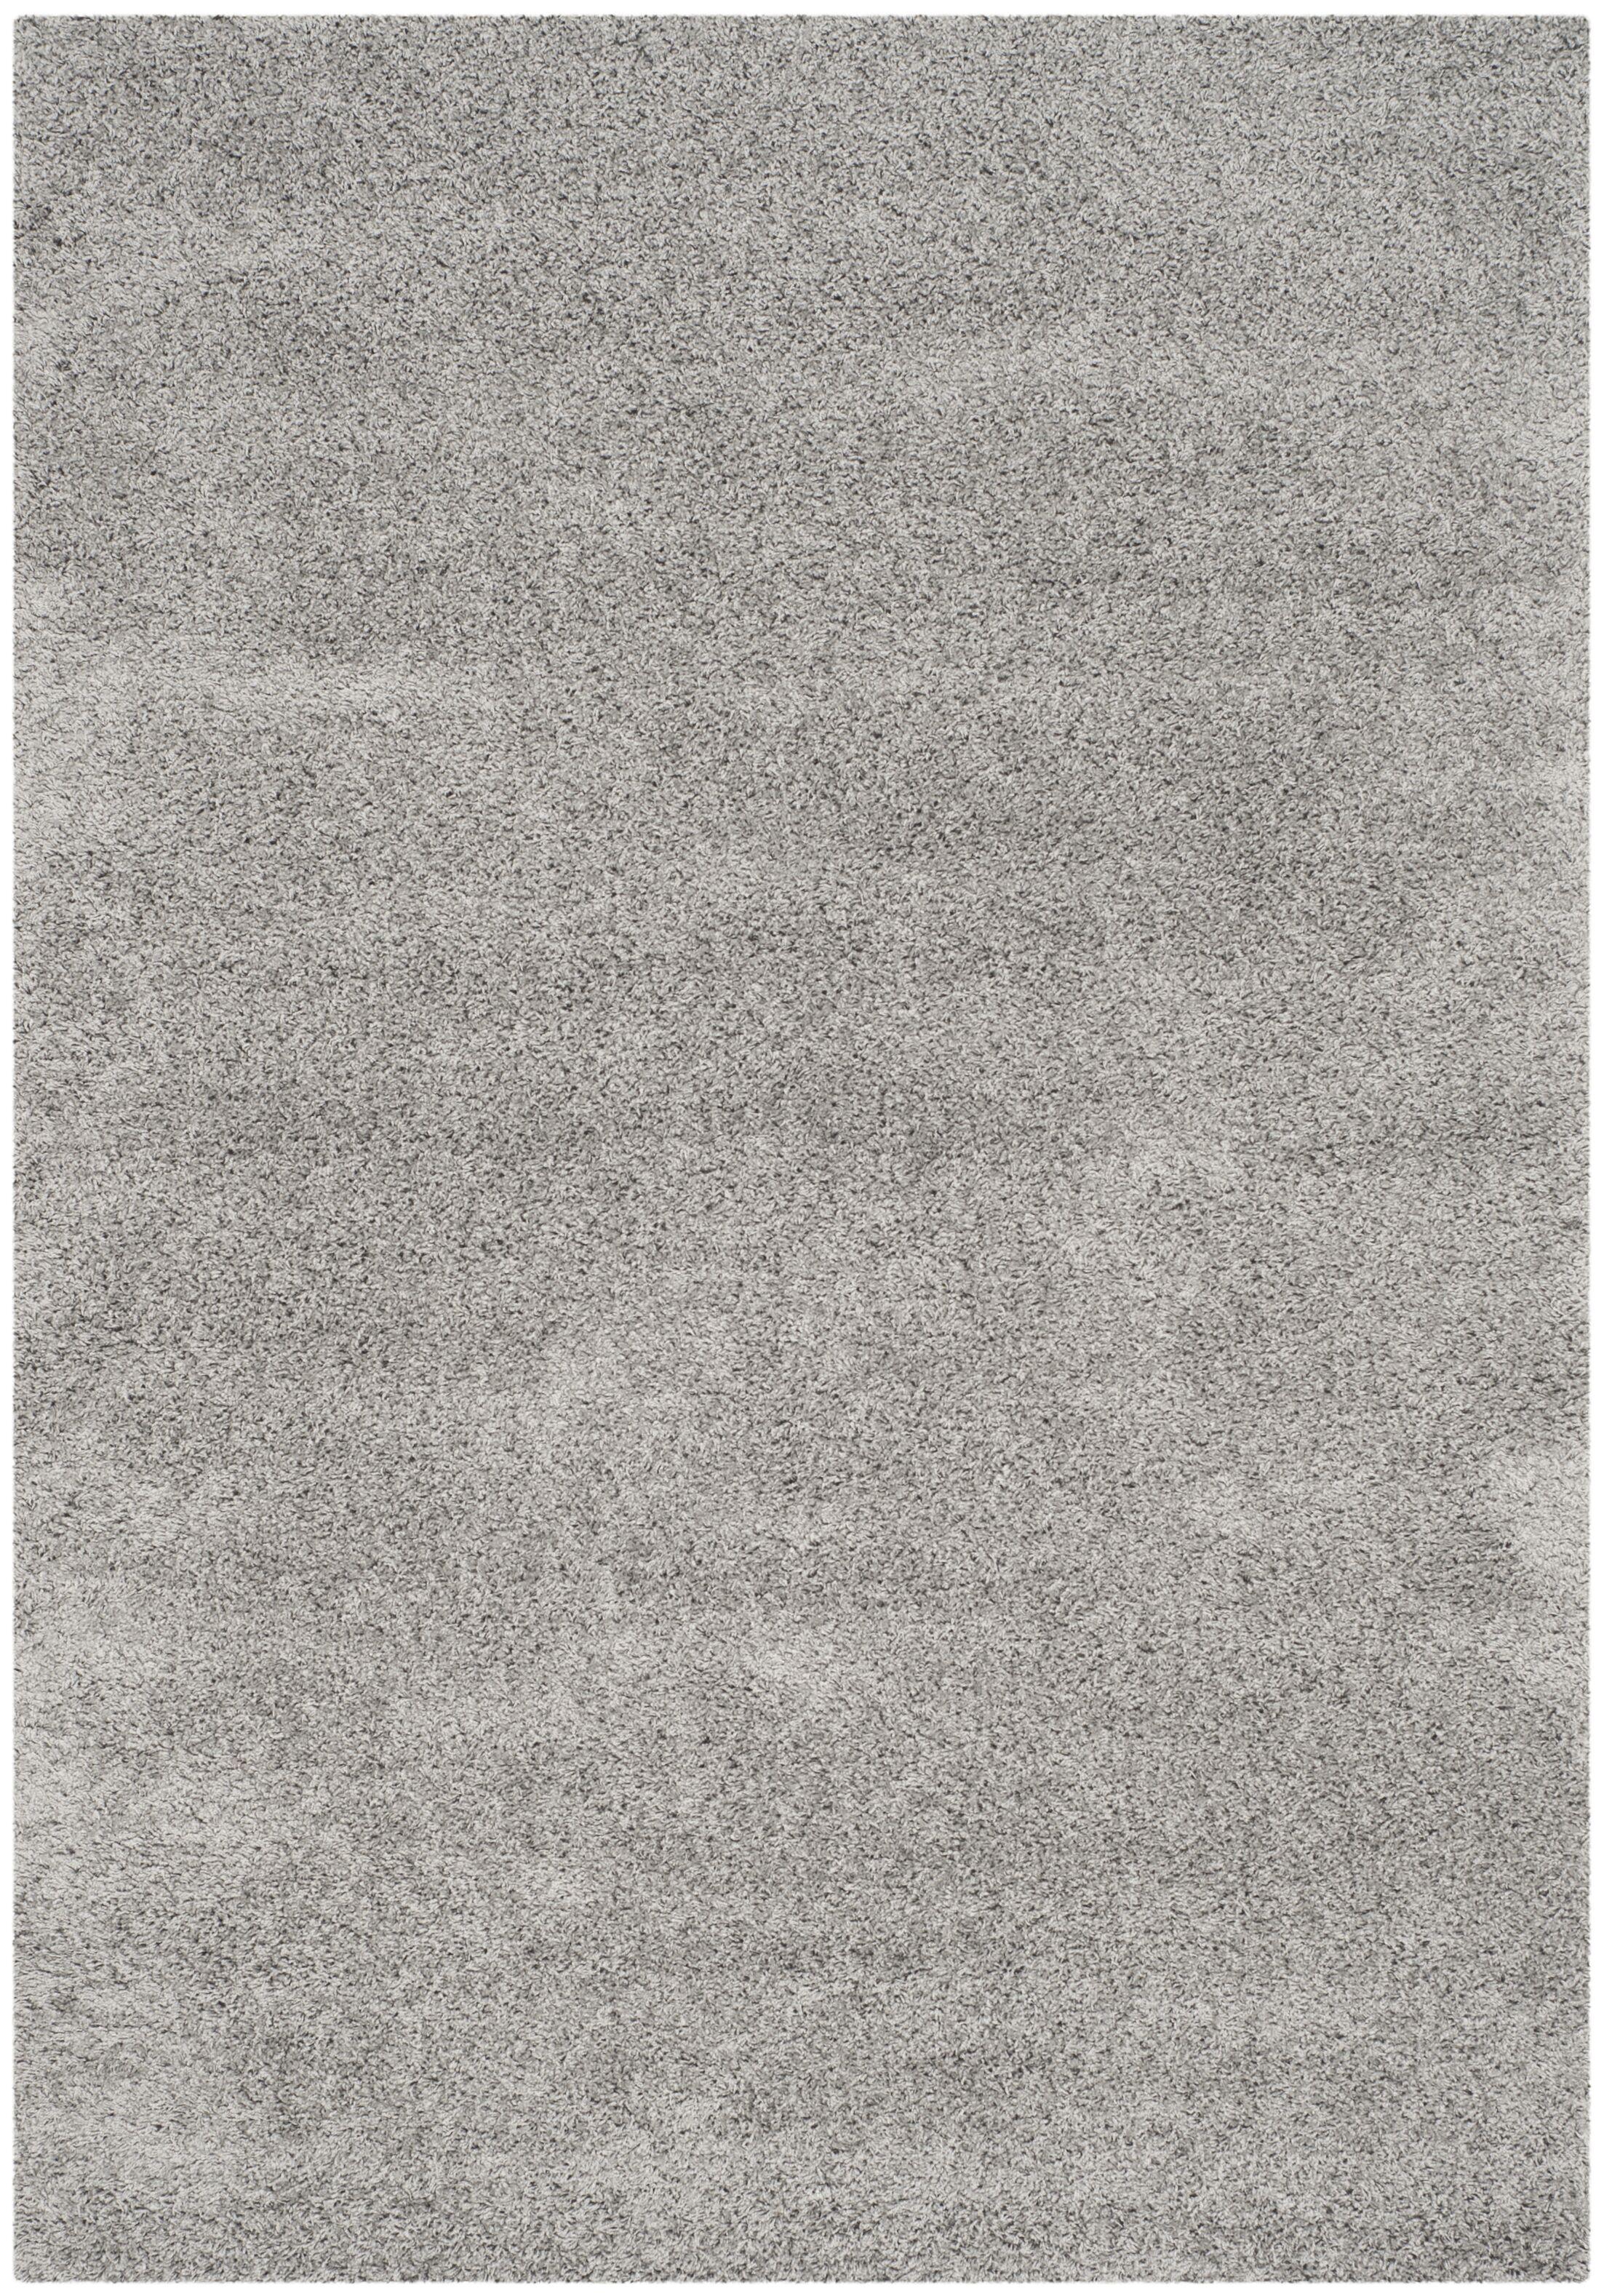 Mccall Silver Shag Area Rug Rug Size: Rectangle 6'7